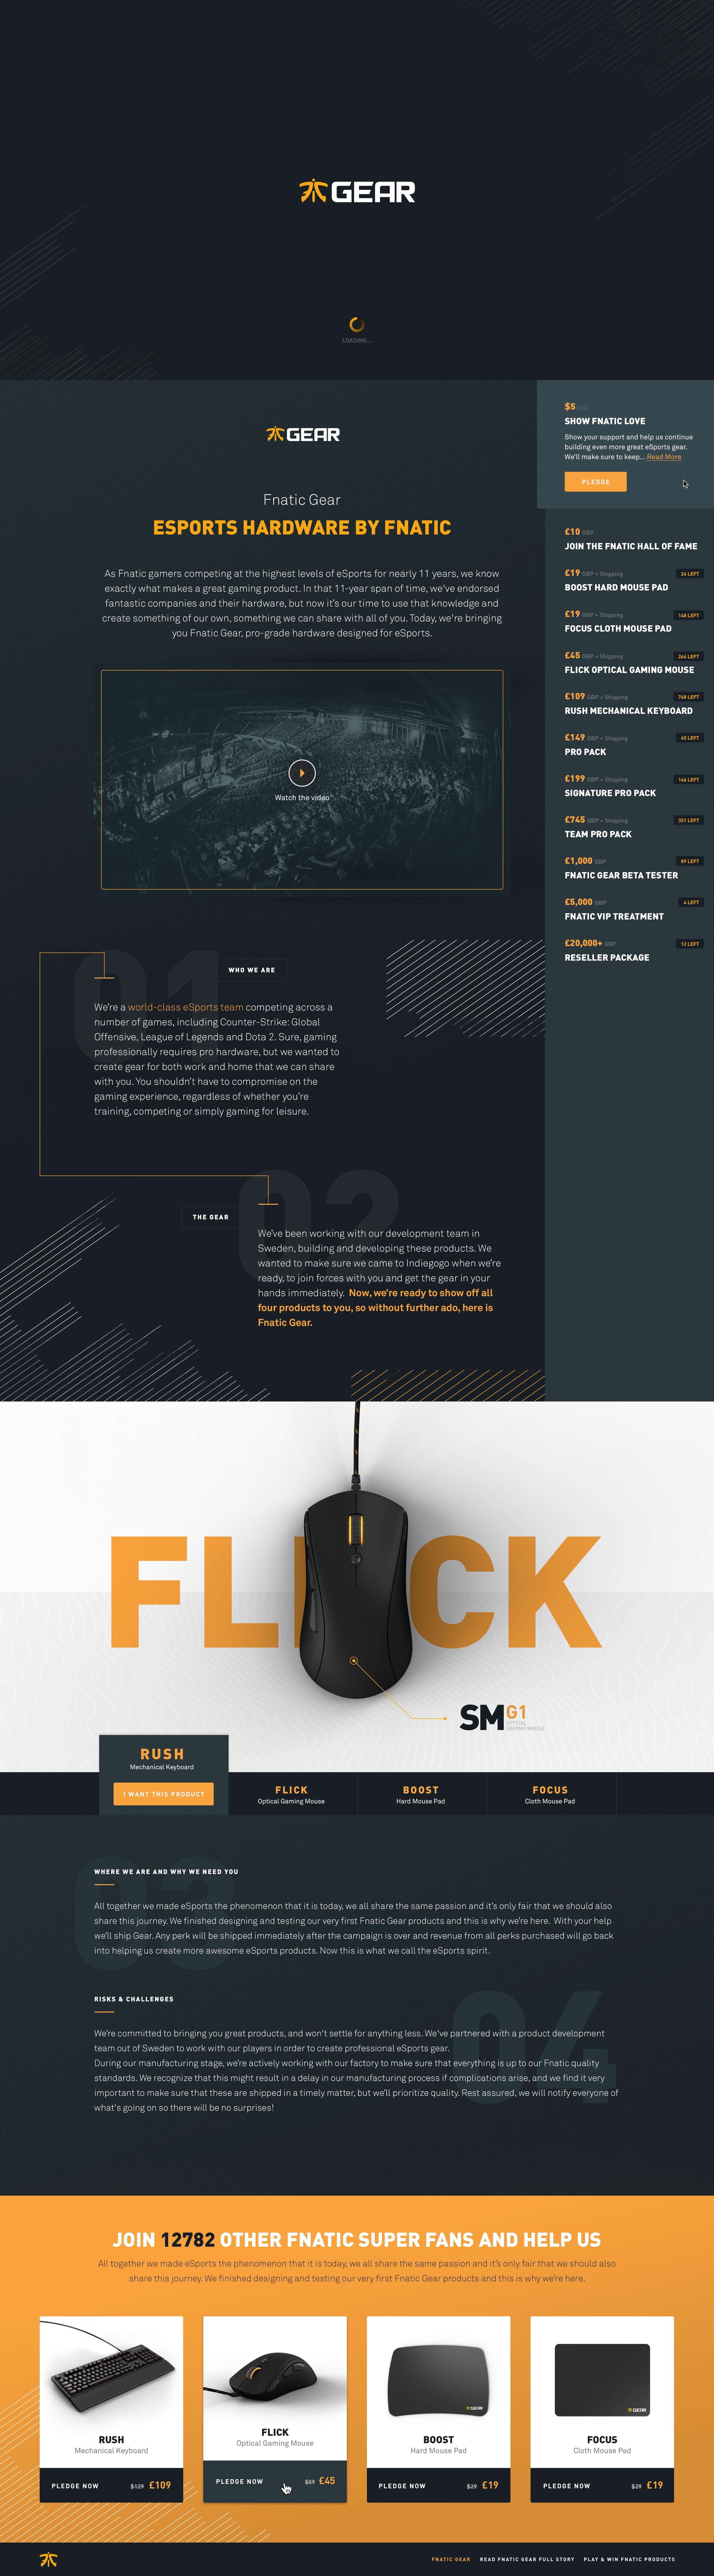 Fnaticgear page